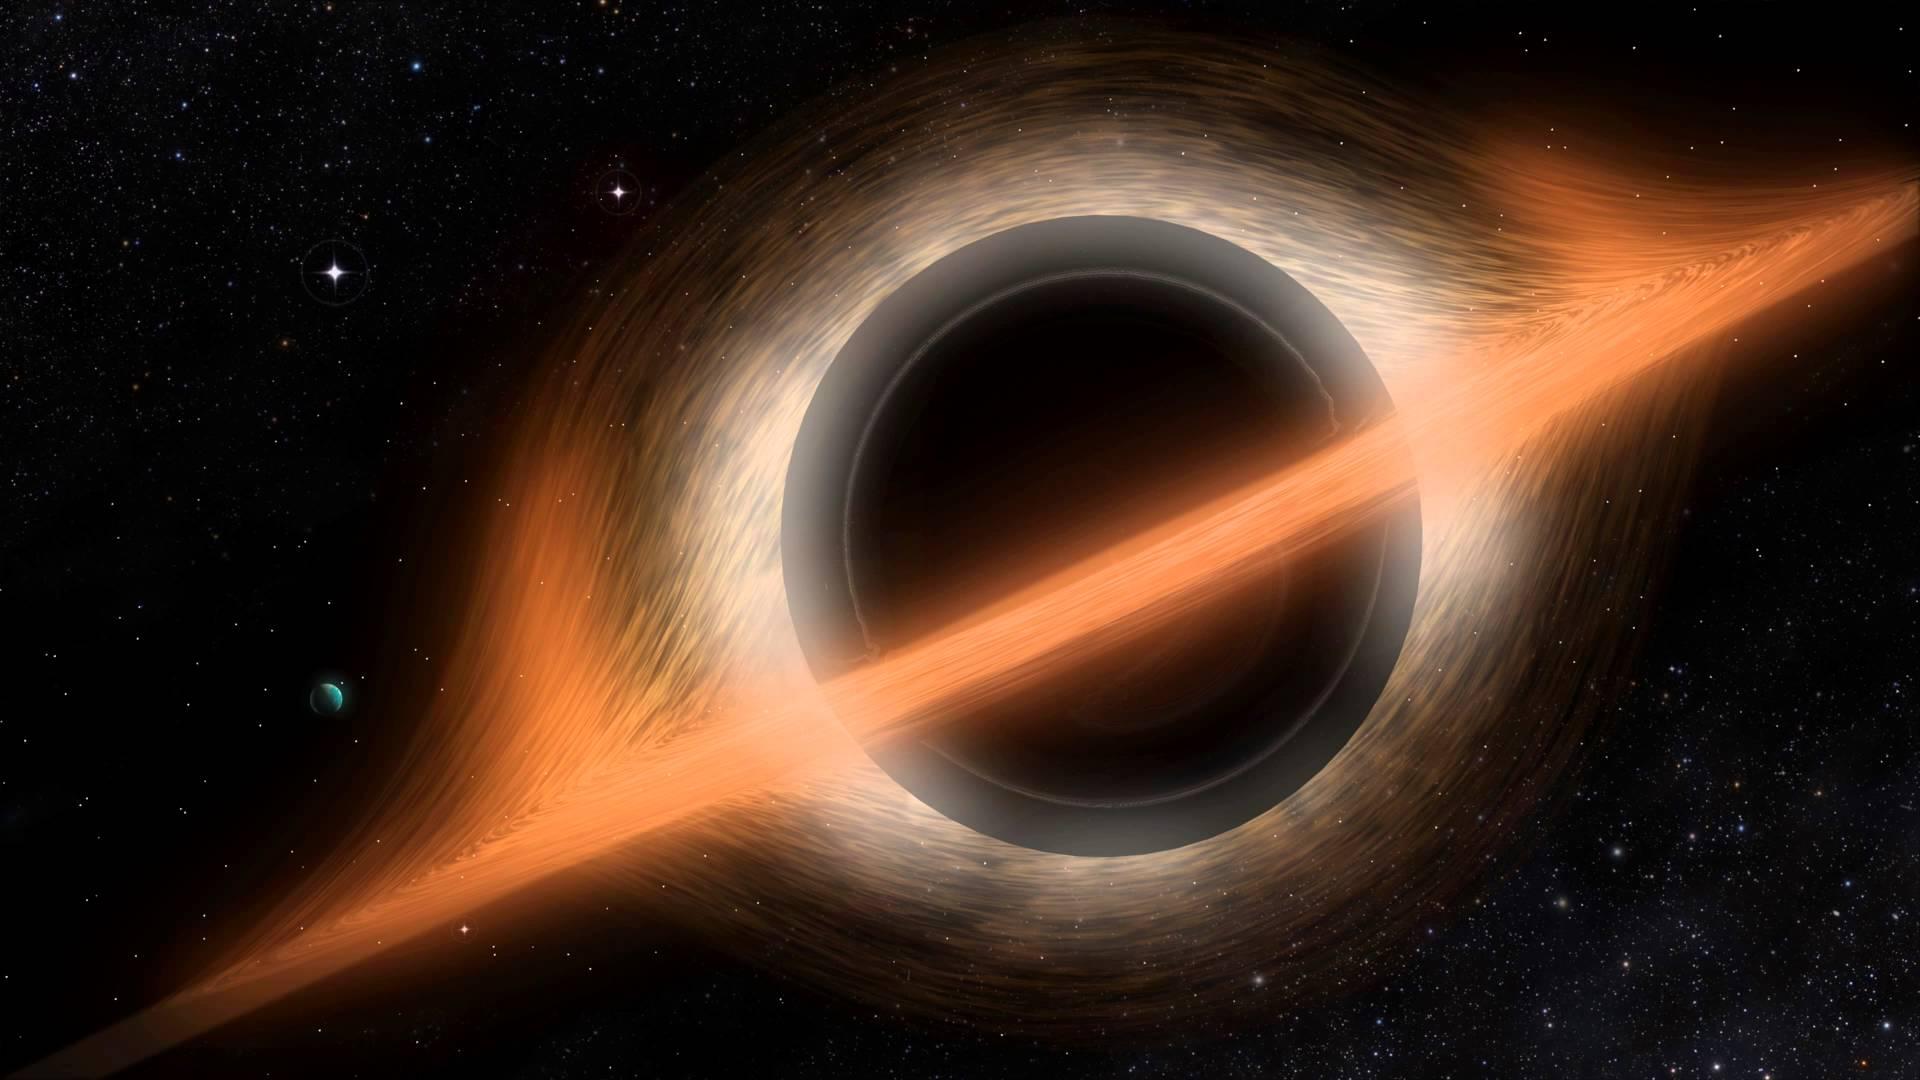 4k Black Hole Wallpapers Top Free 4k Black Hole